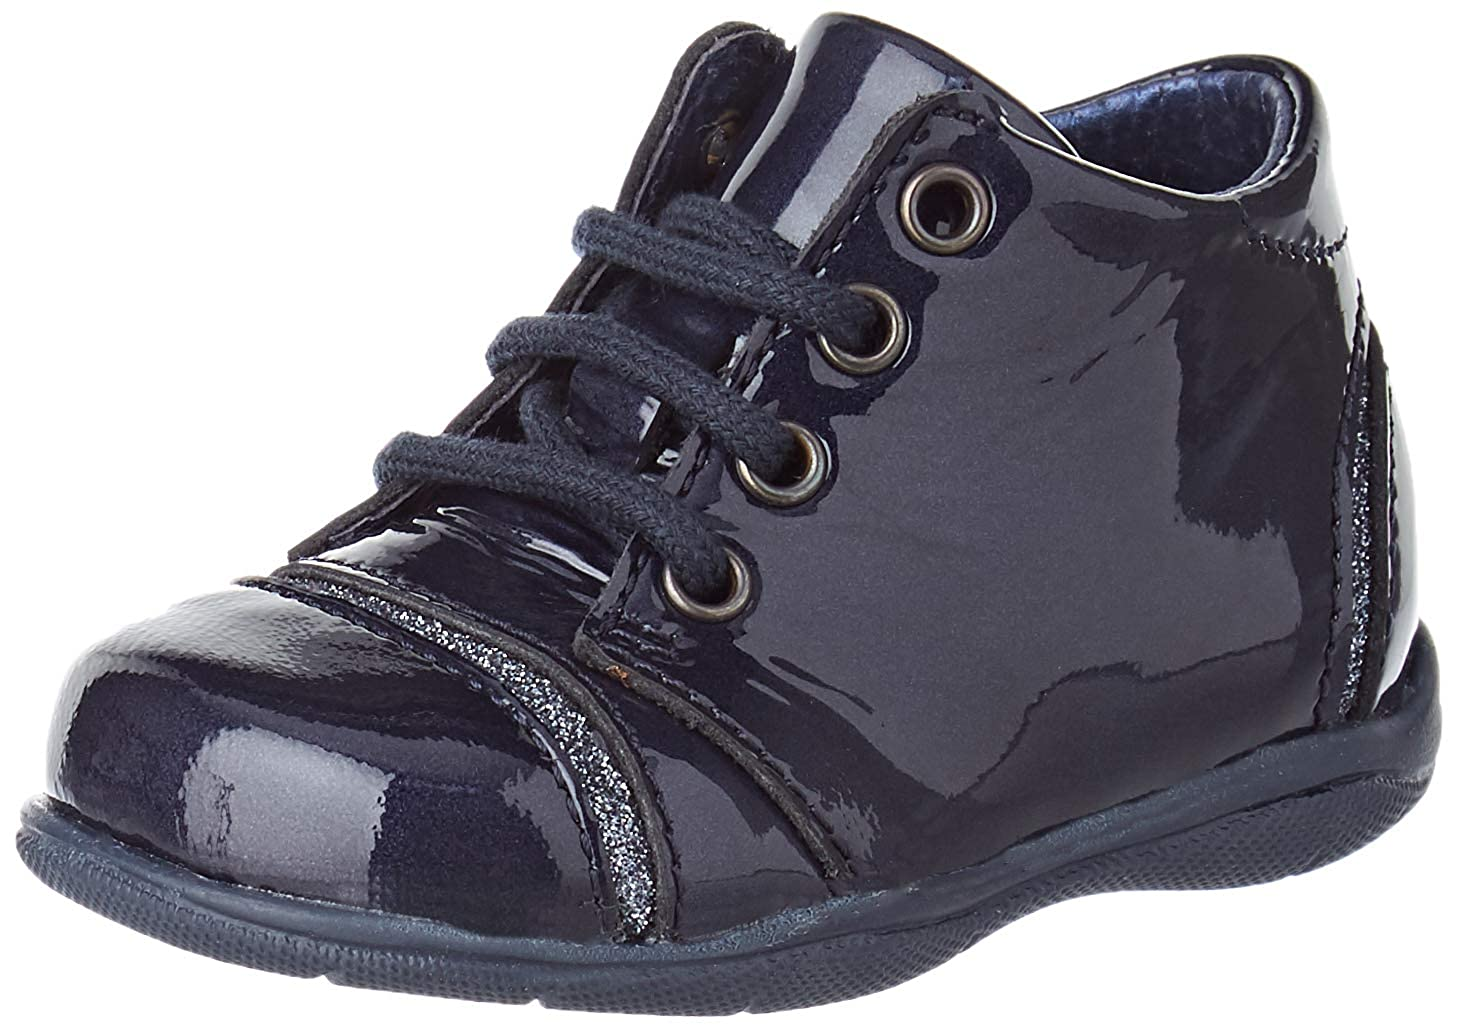 Cp88981541615632 Montantes Chaussures Femme 2 Crazyflight Adidas X WrdCoxBe